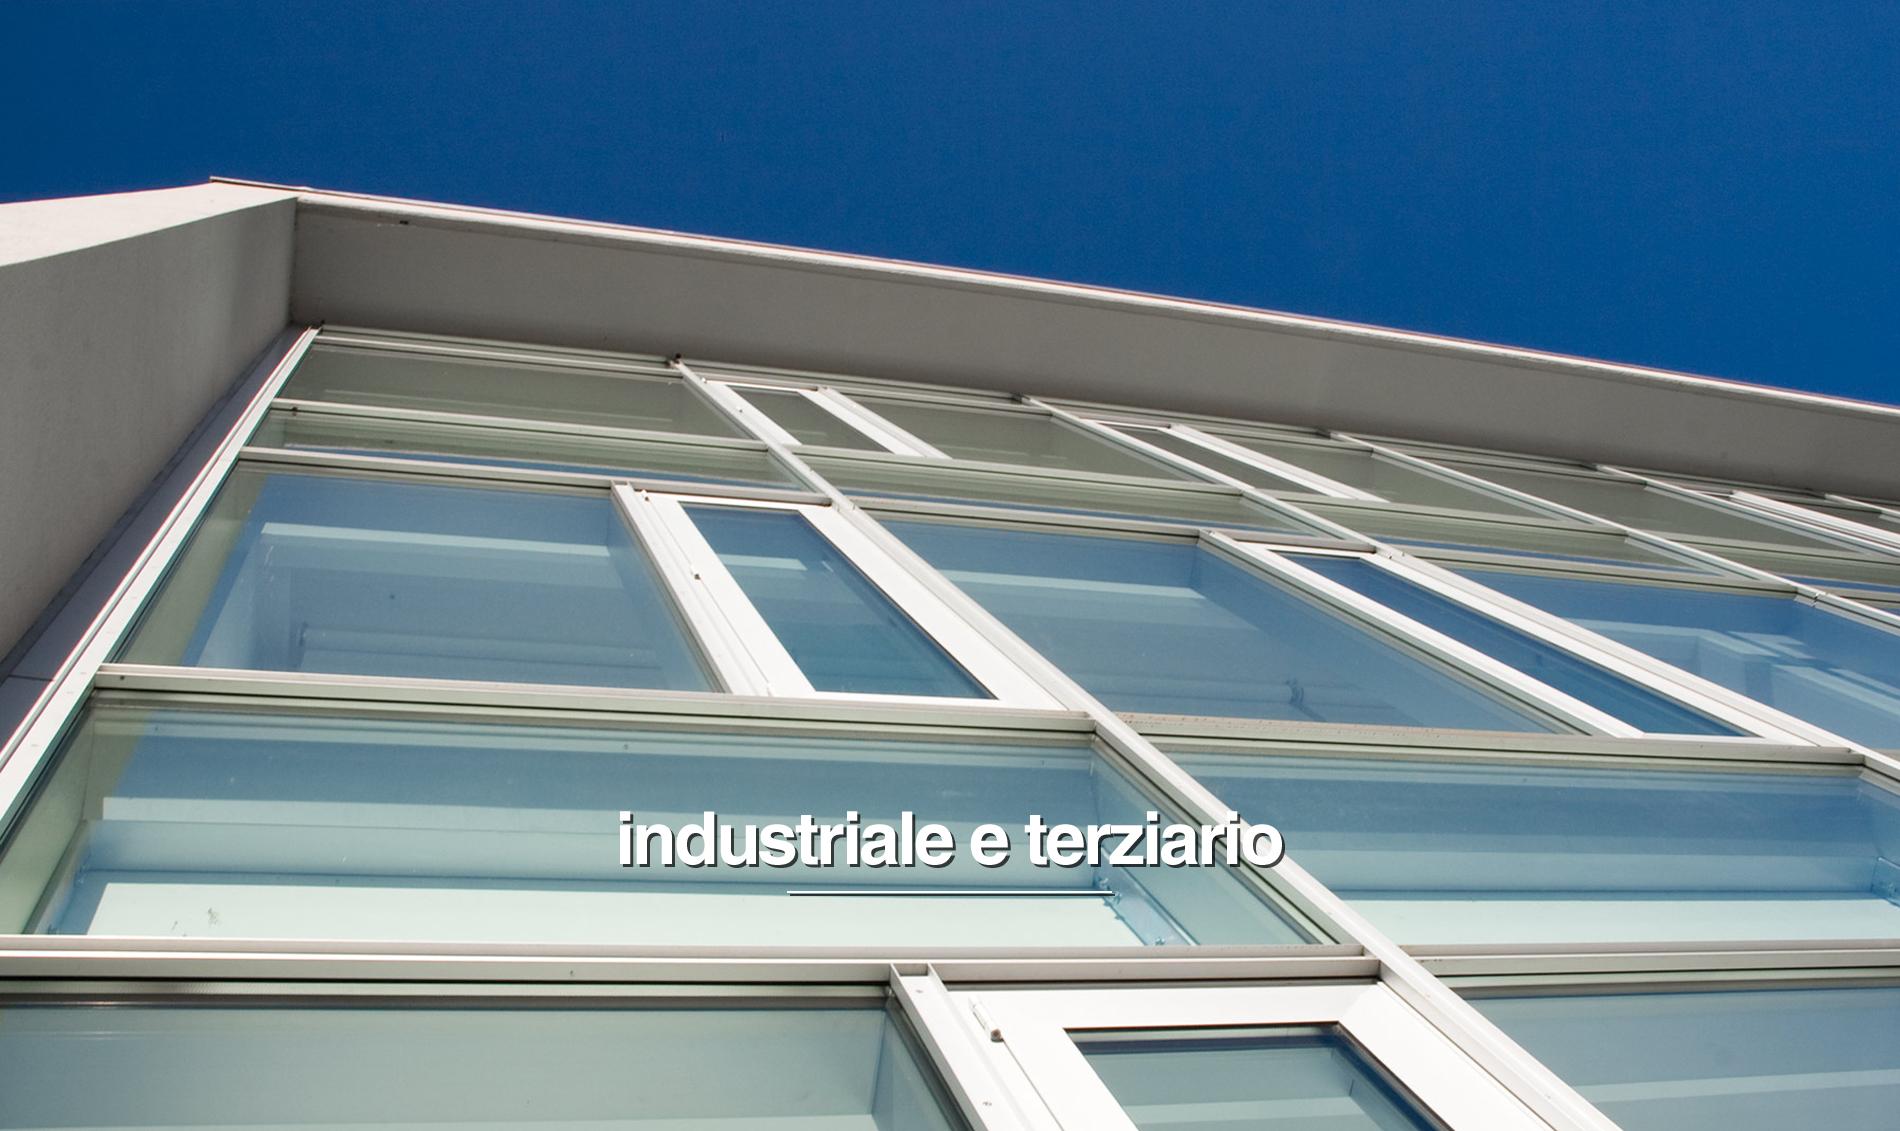 Industriale e terziario